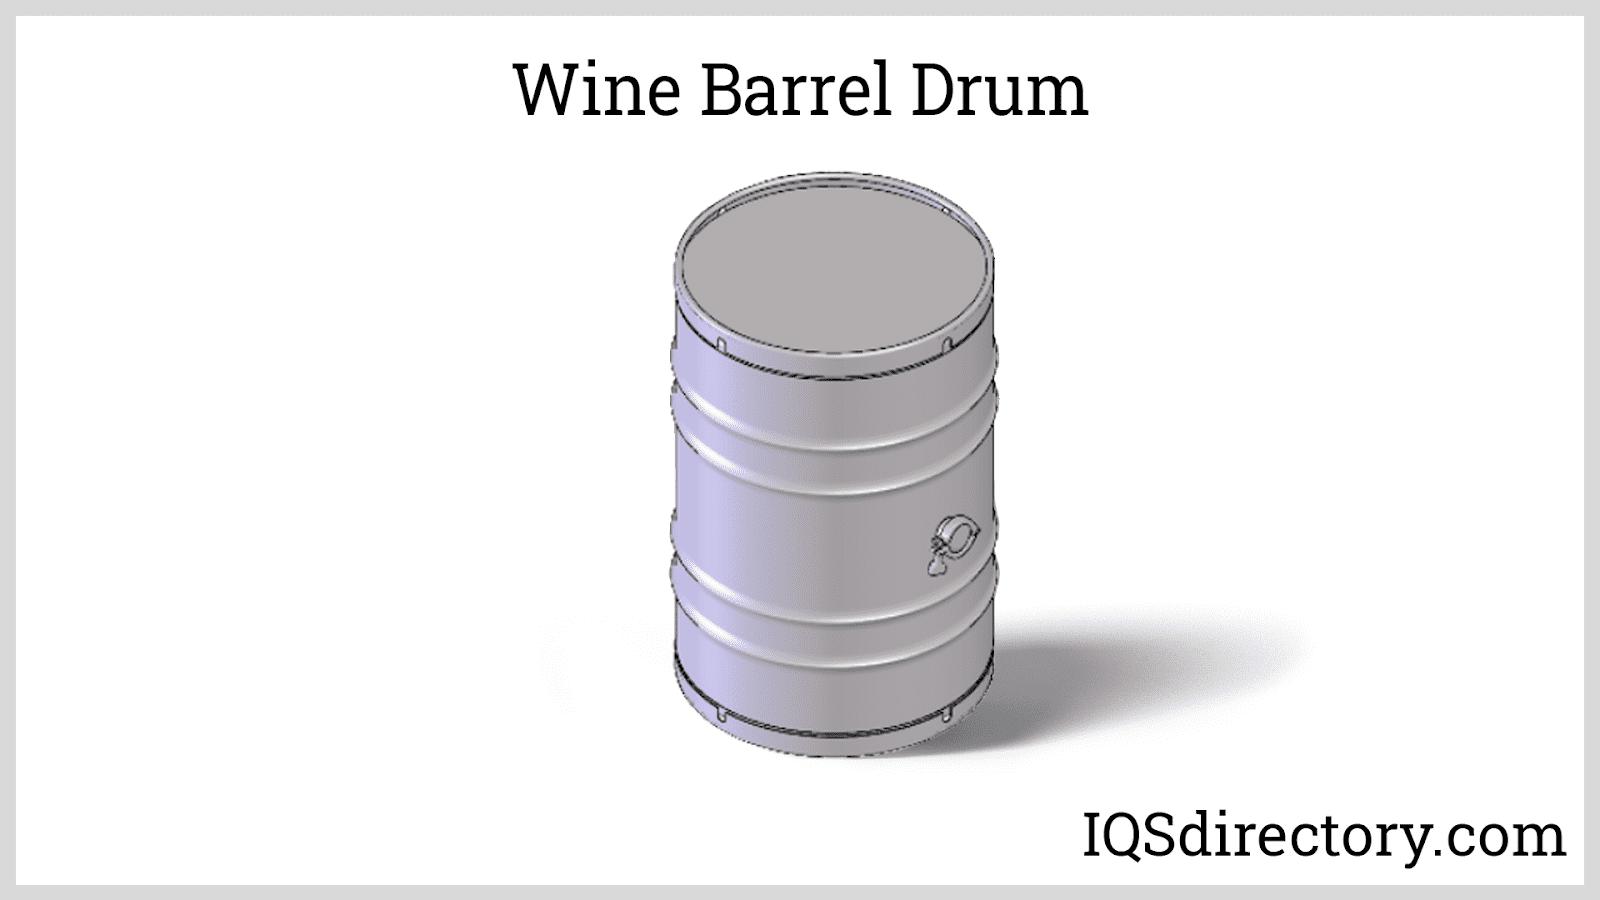 Wine Barrel Drum